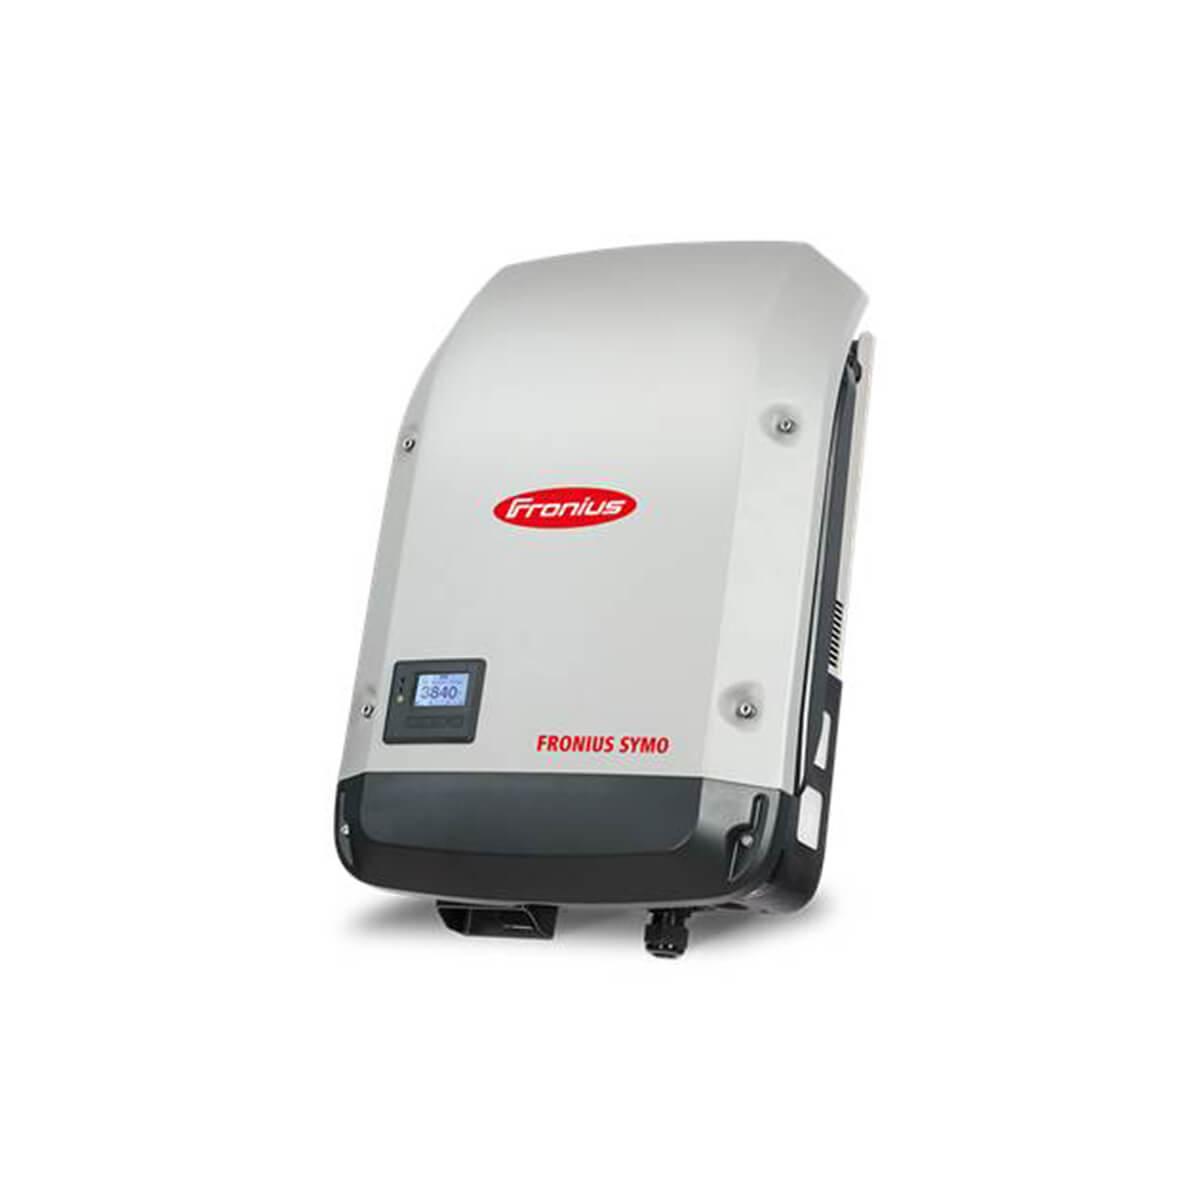 fronius 4.5kW inverter, fronius symo 4.5kW inverter, fronius symo 4.5-3-s inverter, fronius symo 4.5-3-s, fronius symo 4.5 kW, FRONIUS 4.5 KW